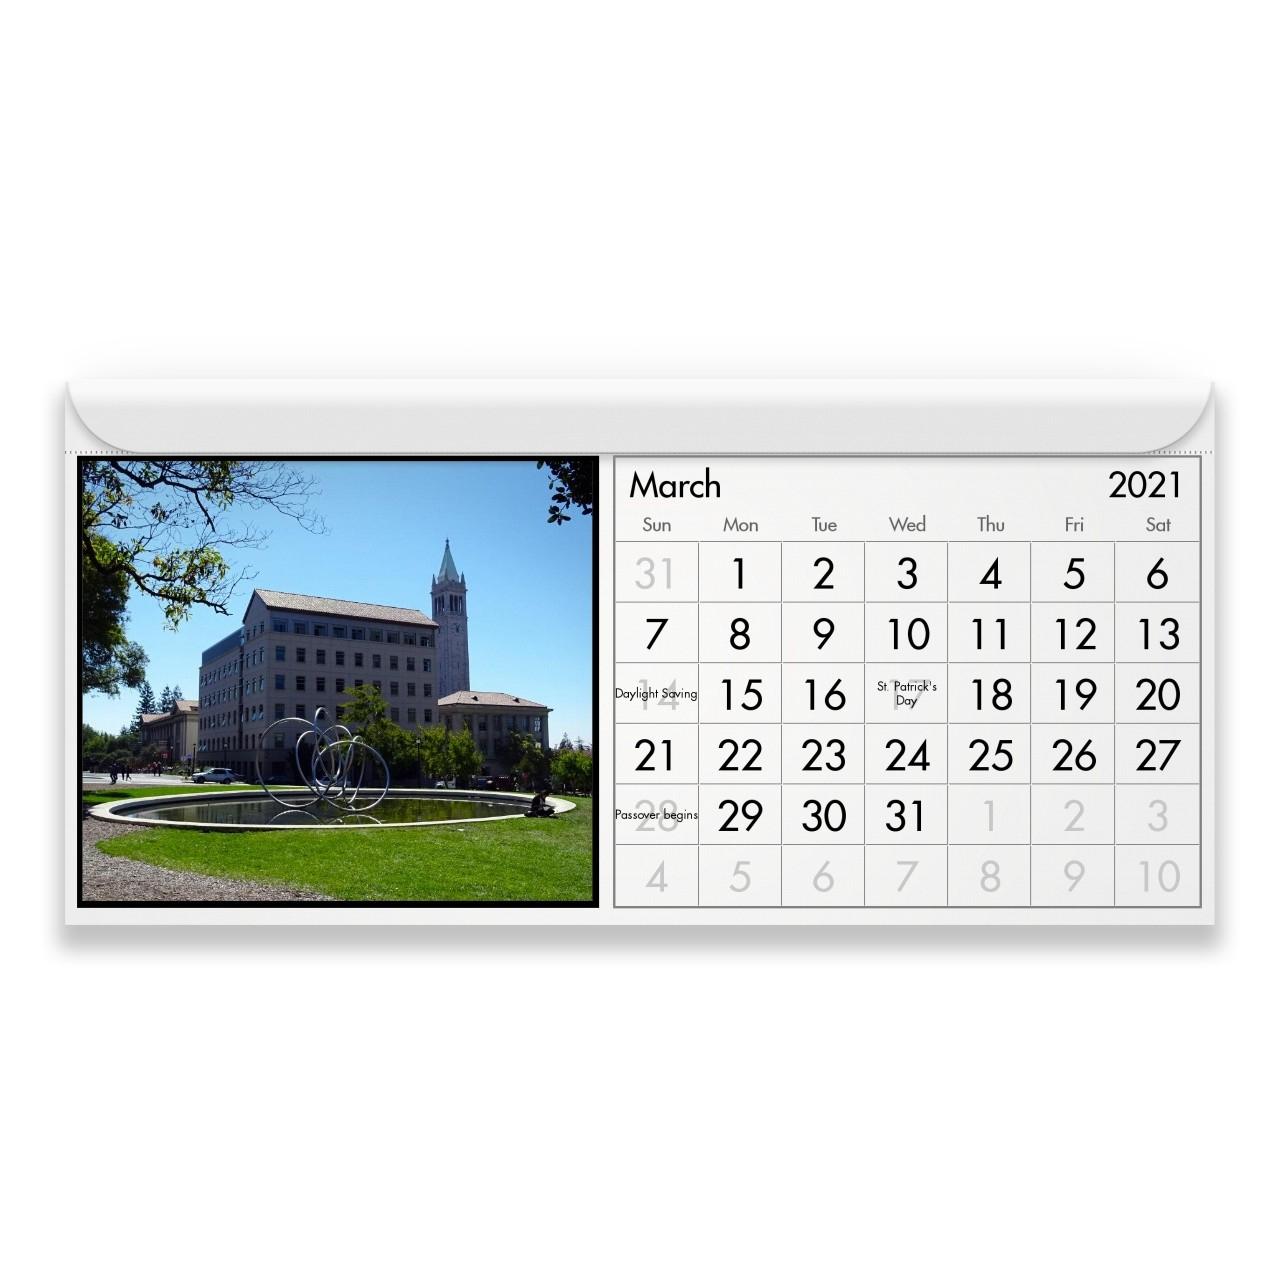 Uiuc 2022 23 Calendar.Academic Calendar Berkeley 2021